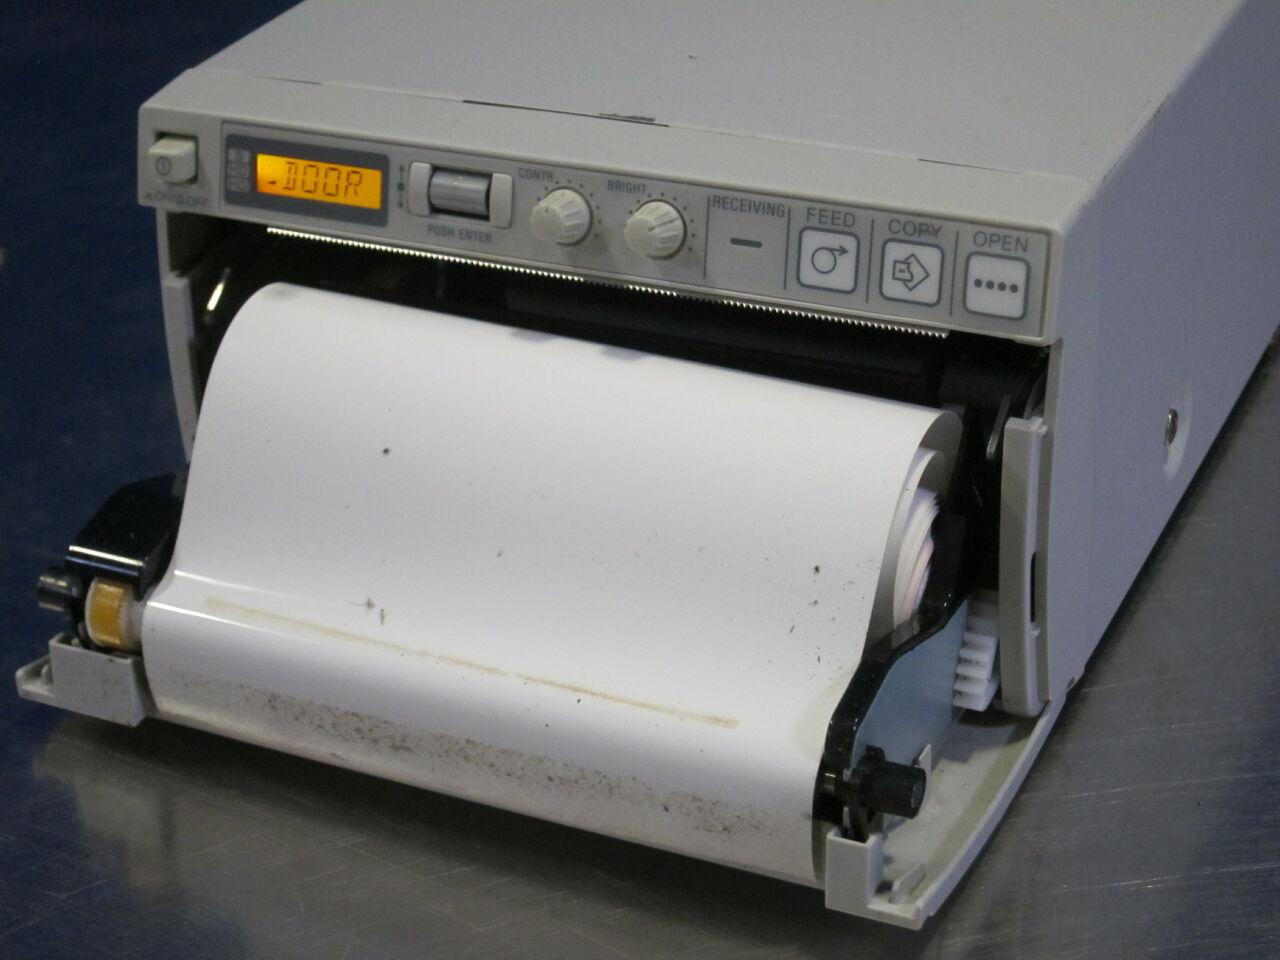 SONY UP-D897 Printer